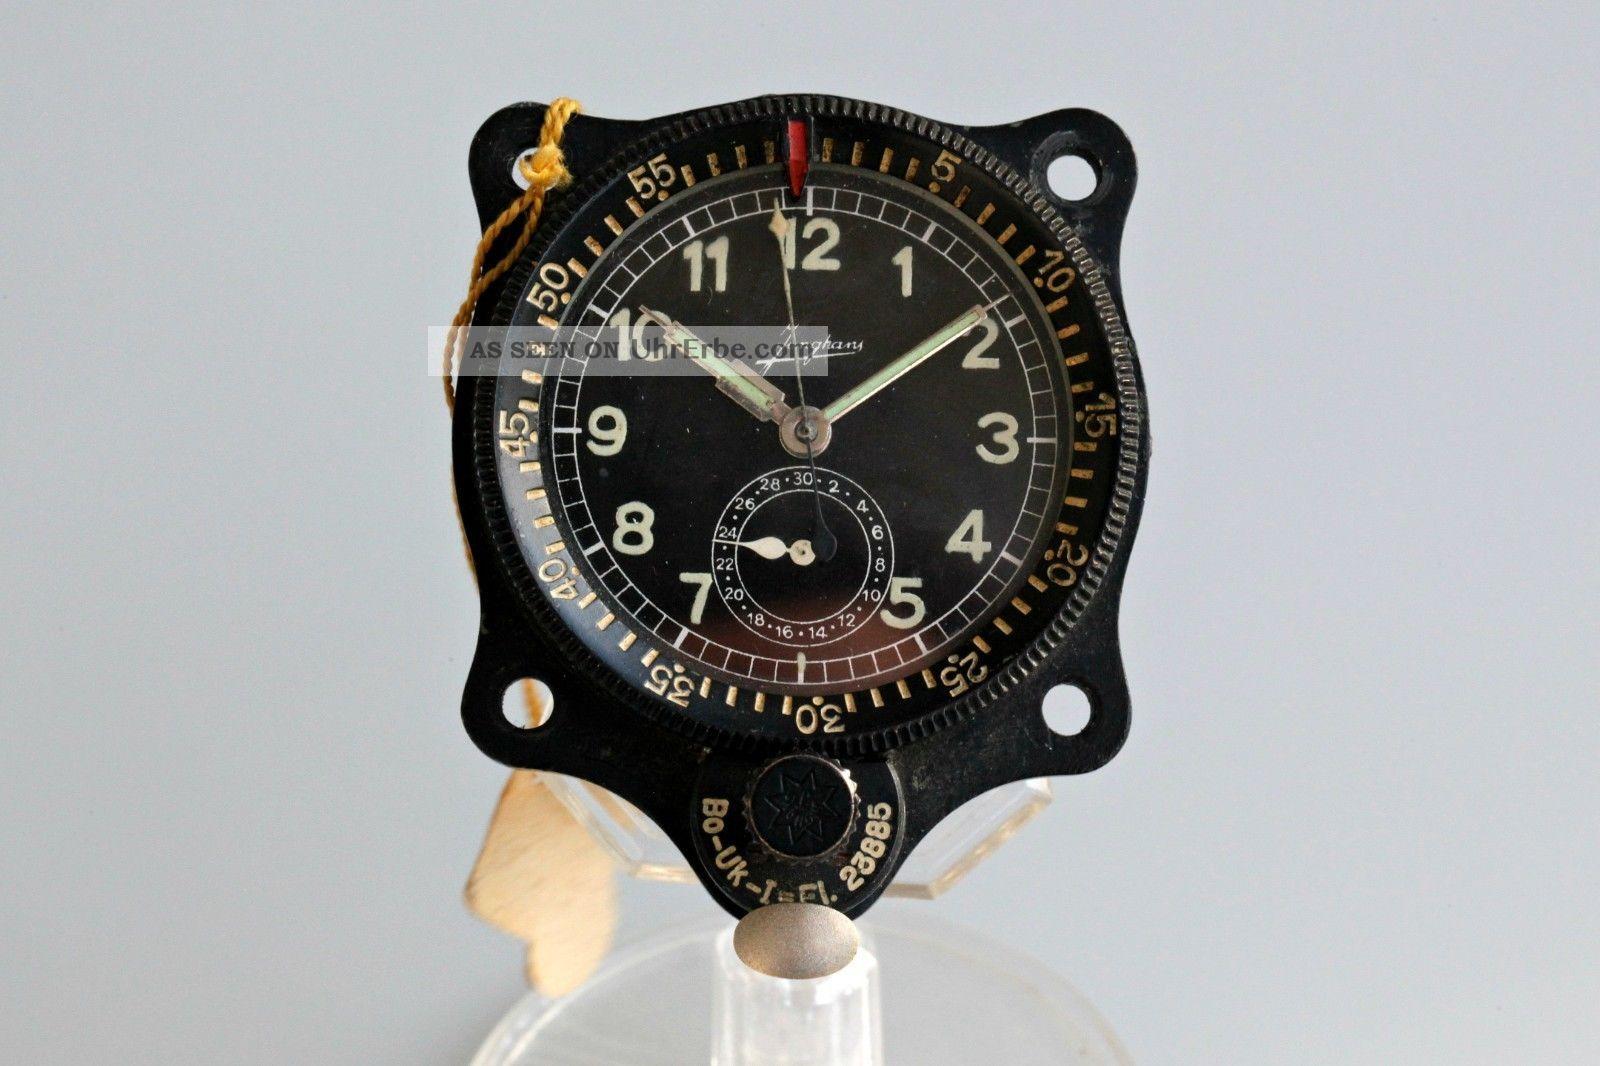 Junghans Deutsche Luftwaffenuhr Bo - Uk1 Borduhr/blindfluguhr Fl23885 - 2.  Wk. Armbanduhren Bild